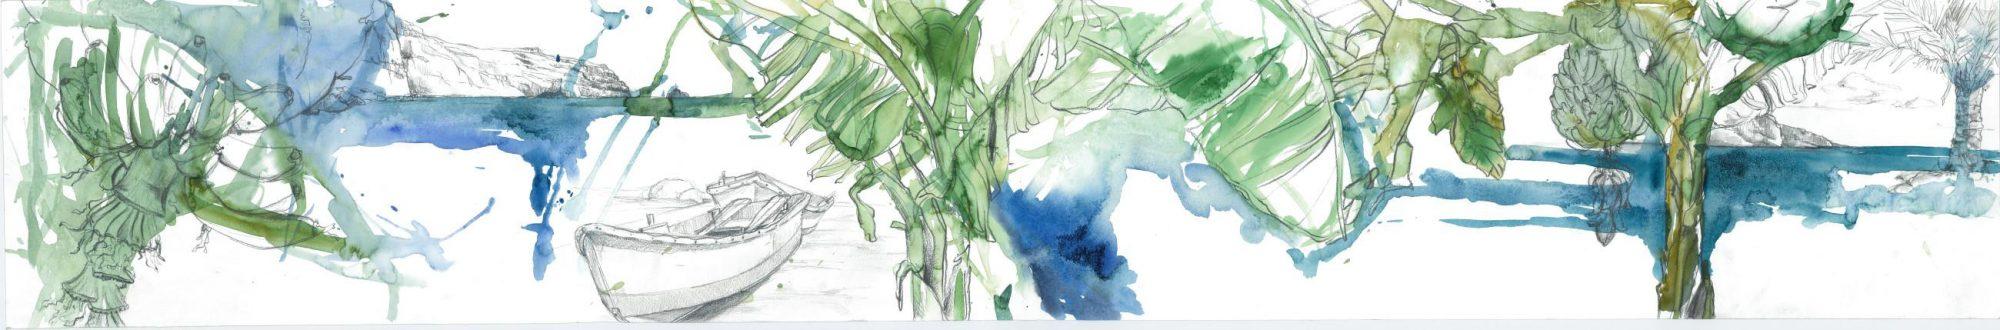 Gomera - Platano, 2013 Aquarell, 150x25 cm